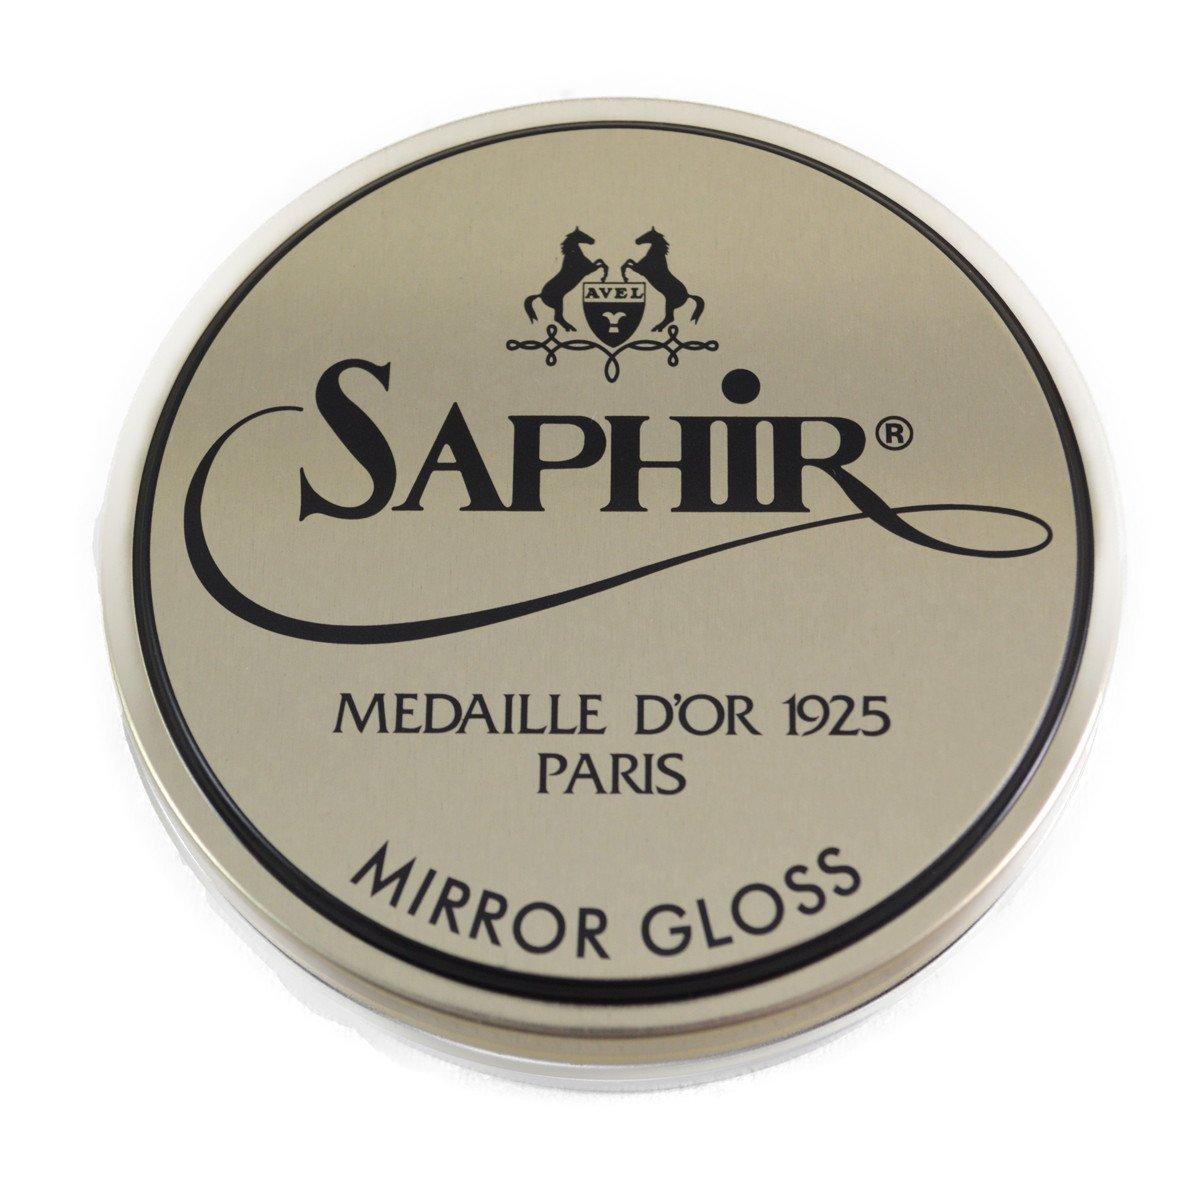 Saphir Medaille d'Or Mirror Gloss - 4 Colors (Burgundy)